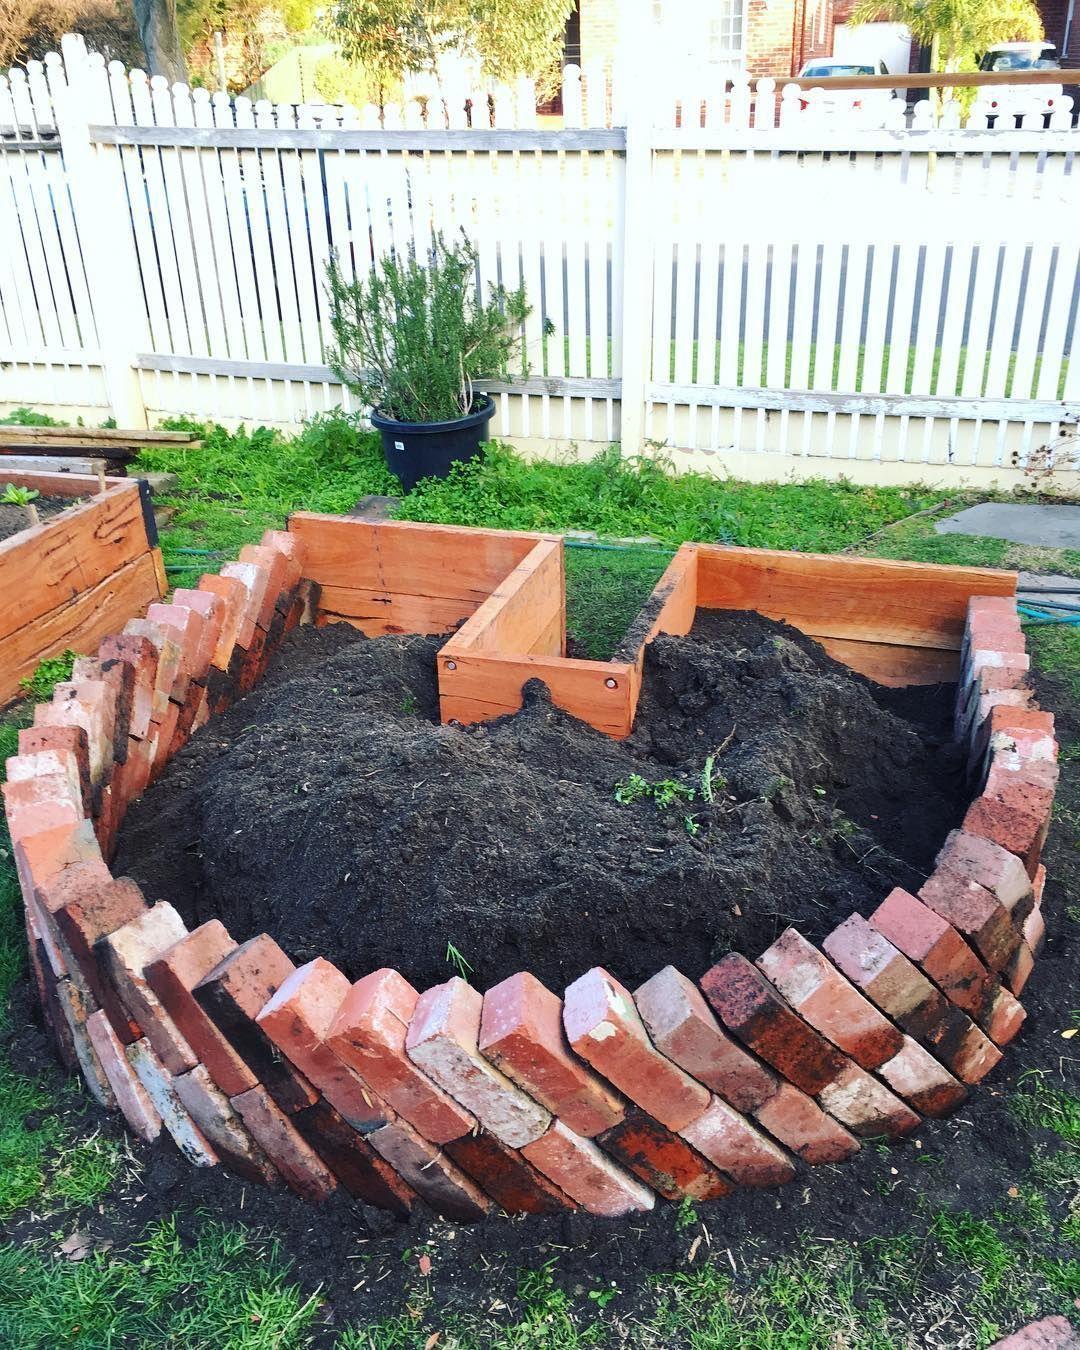 valentineamp;#039;s day aesthetic big garden #garten #garden garten pflaster #garten #garten Im thinking of making...#big #garden #garten #making #pflaster #thinking